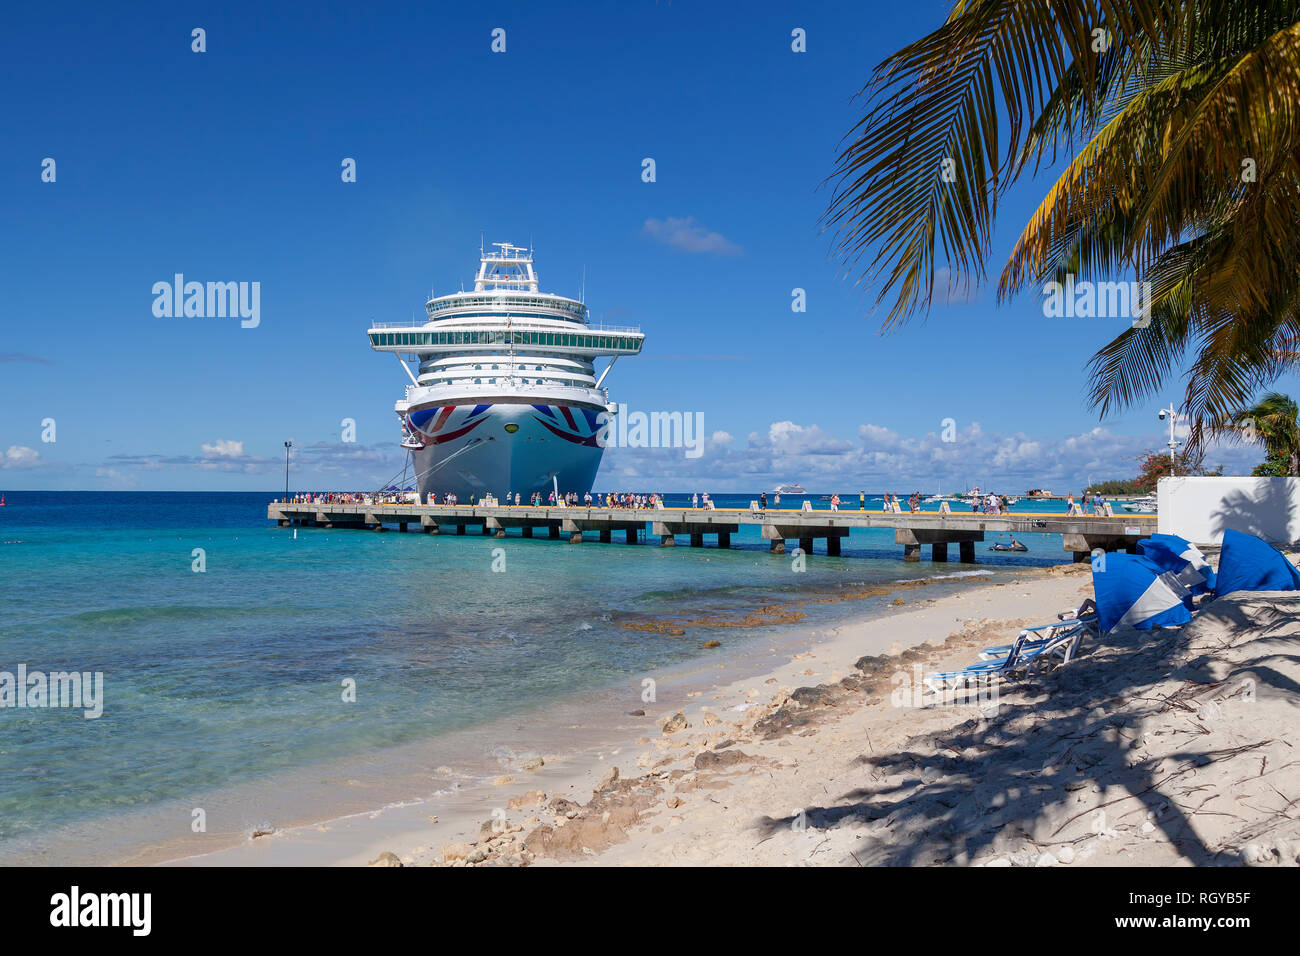 The P&O Azura cruise ship - Stock Image